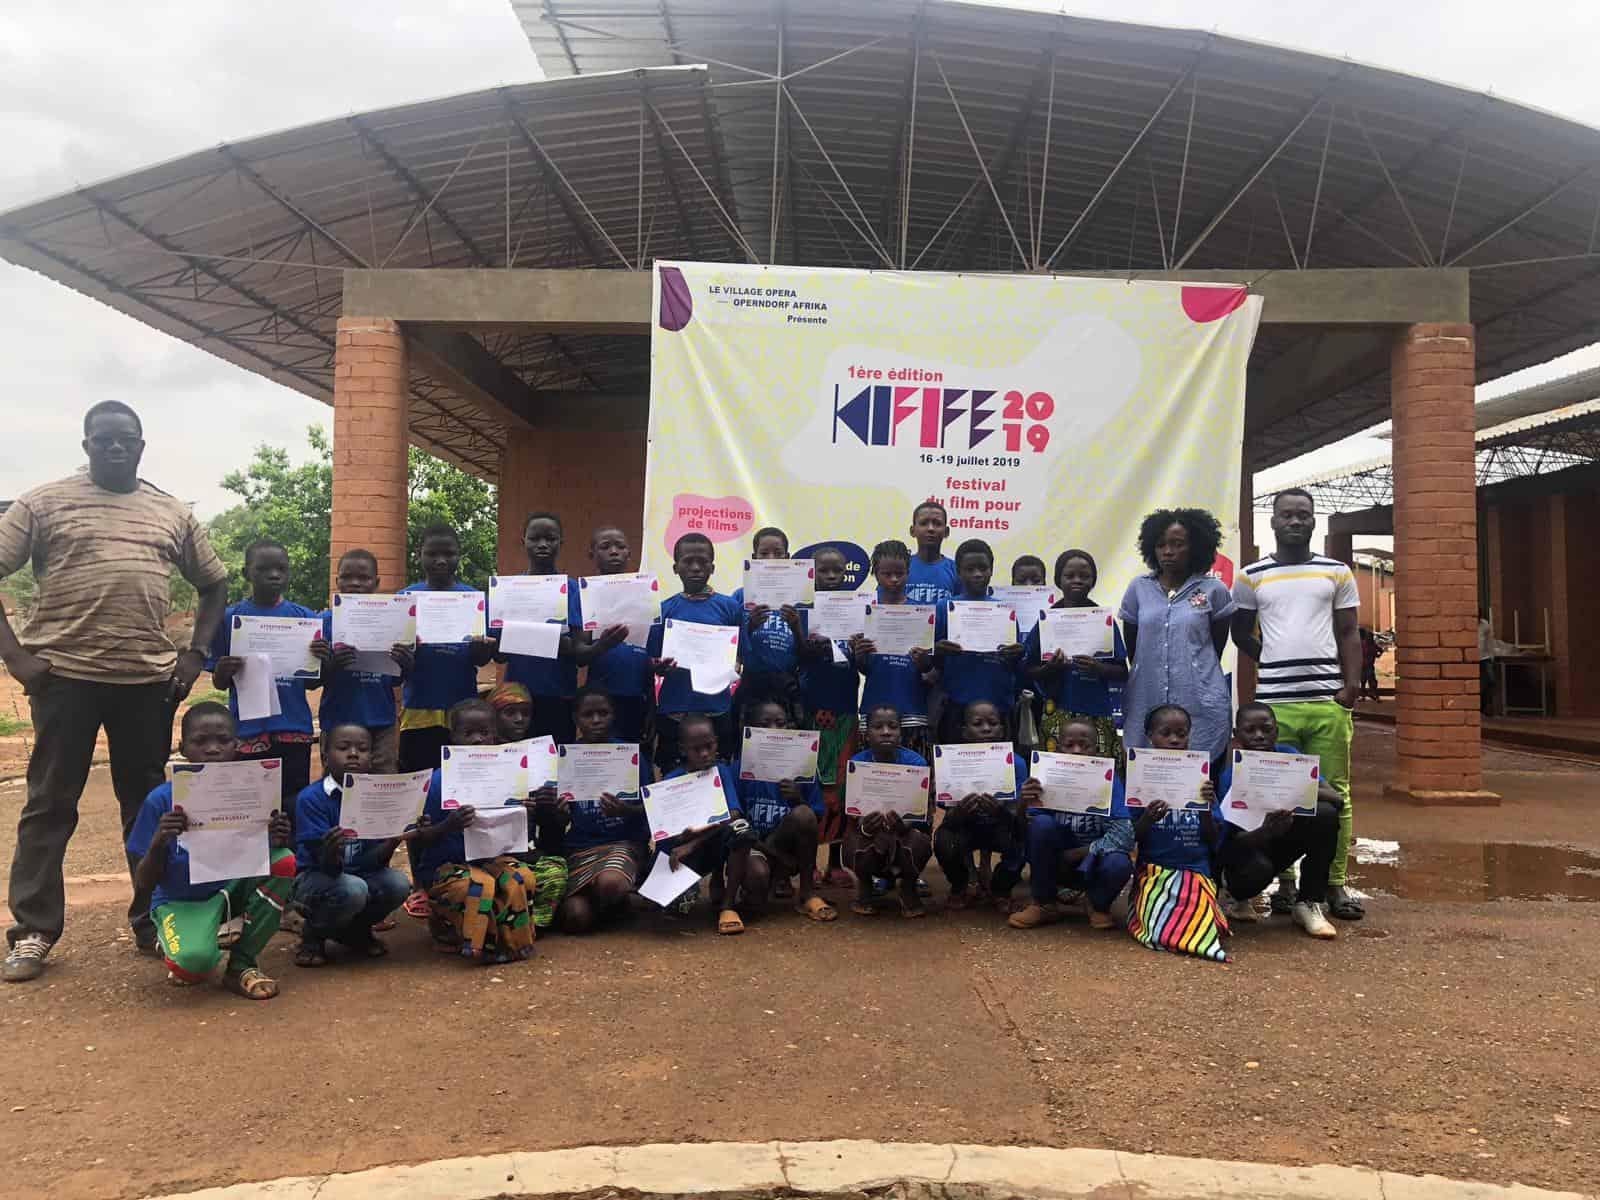 KiFiFE, Kid's Film Festival, Operndorf Afrika, Village Opera, Burkina Faso, Ziniare, Kinder Film Festival, Festival du films pour enfants